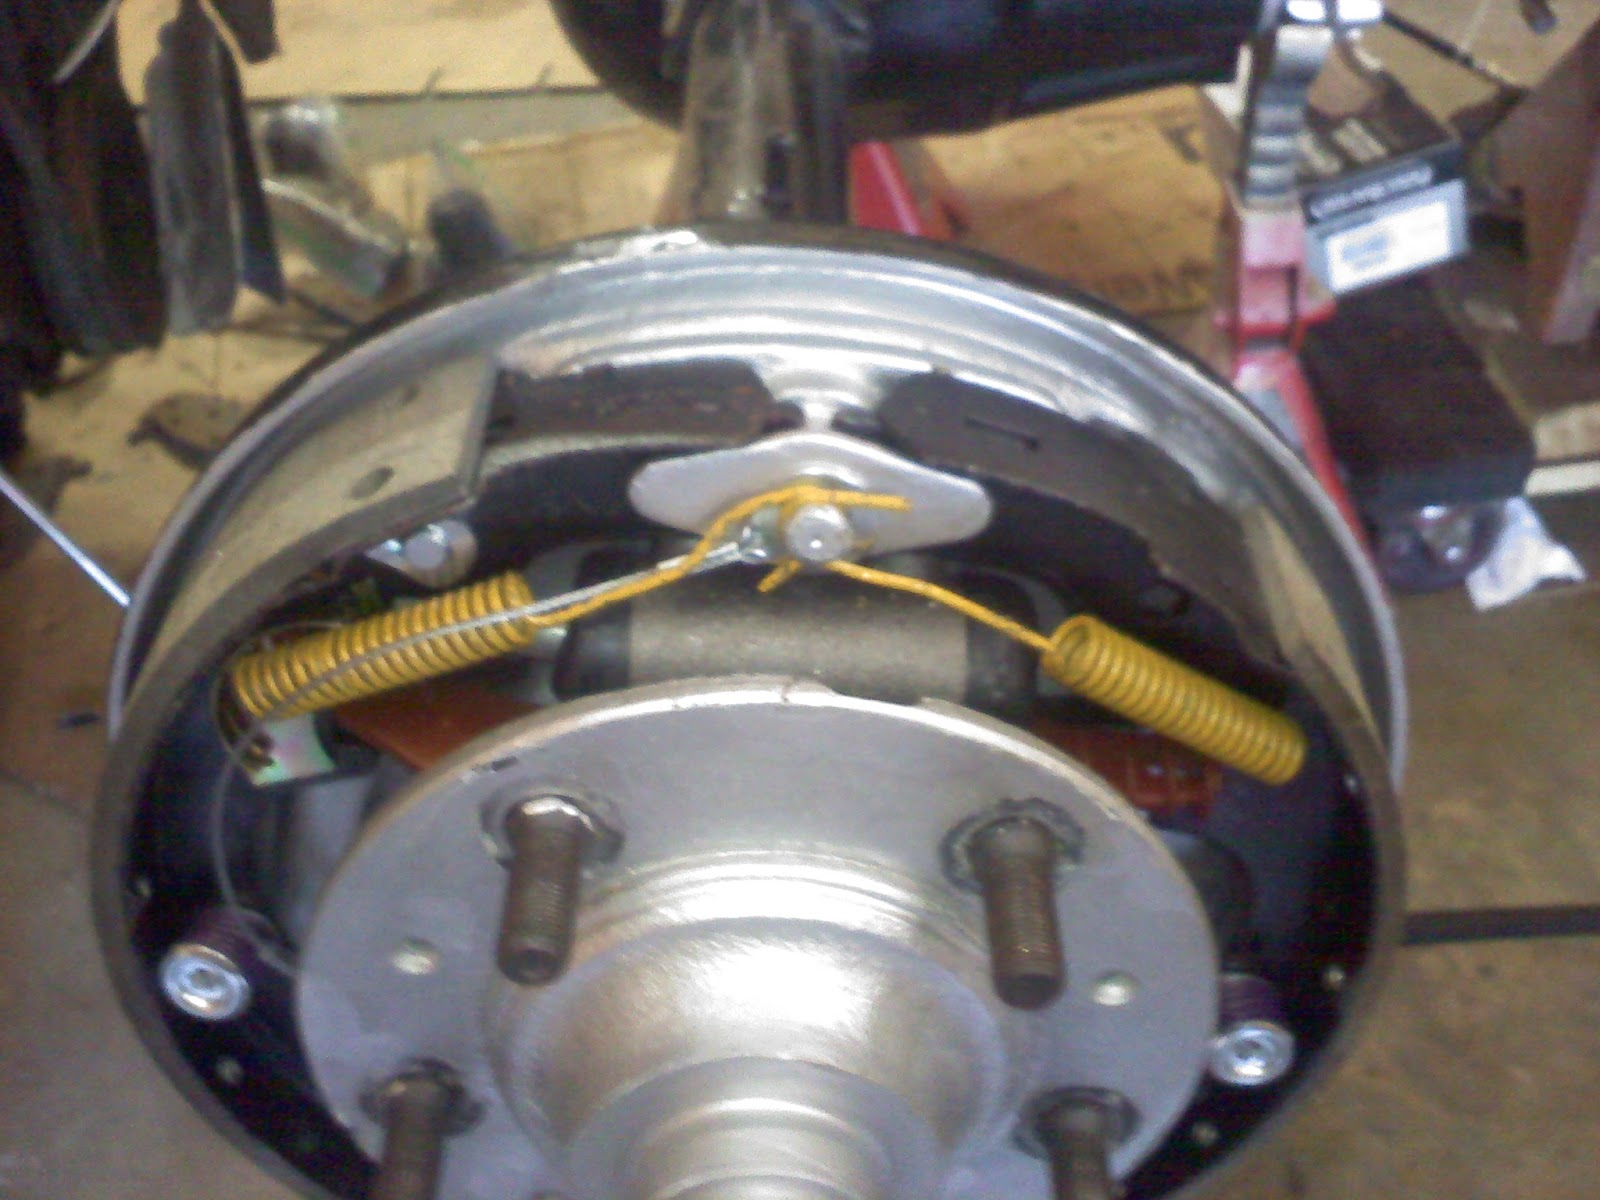 Drum Brake Install On Amc 20 Rear Axle